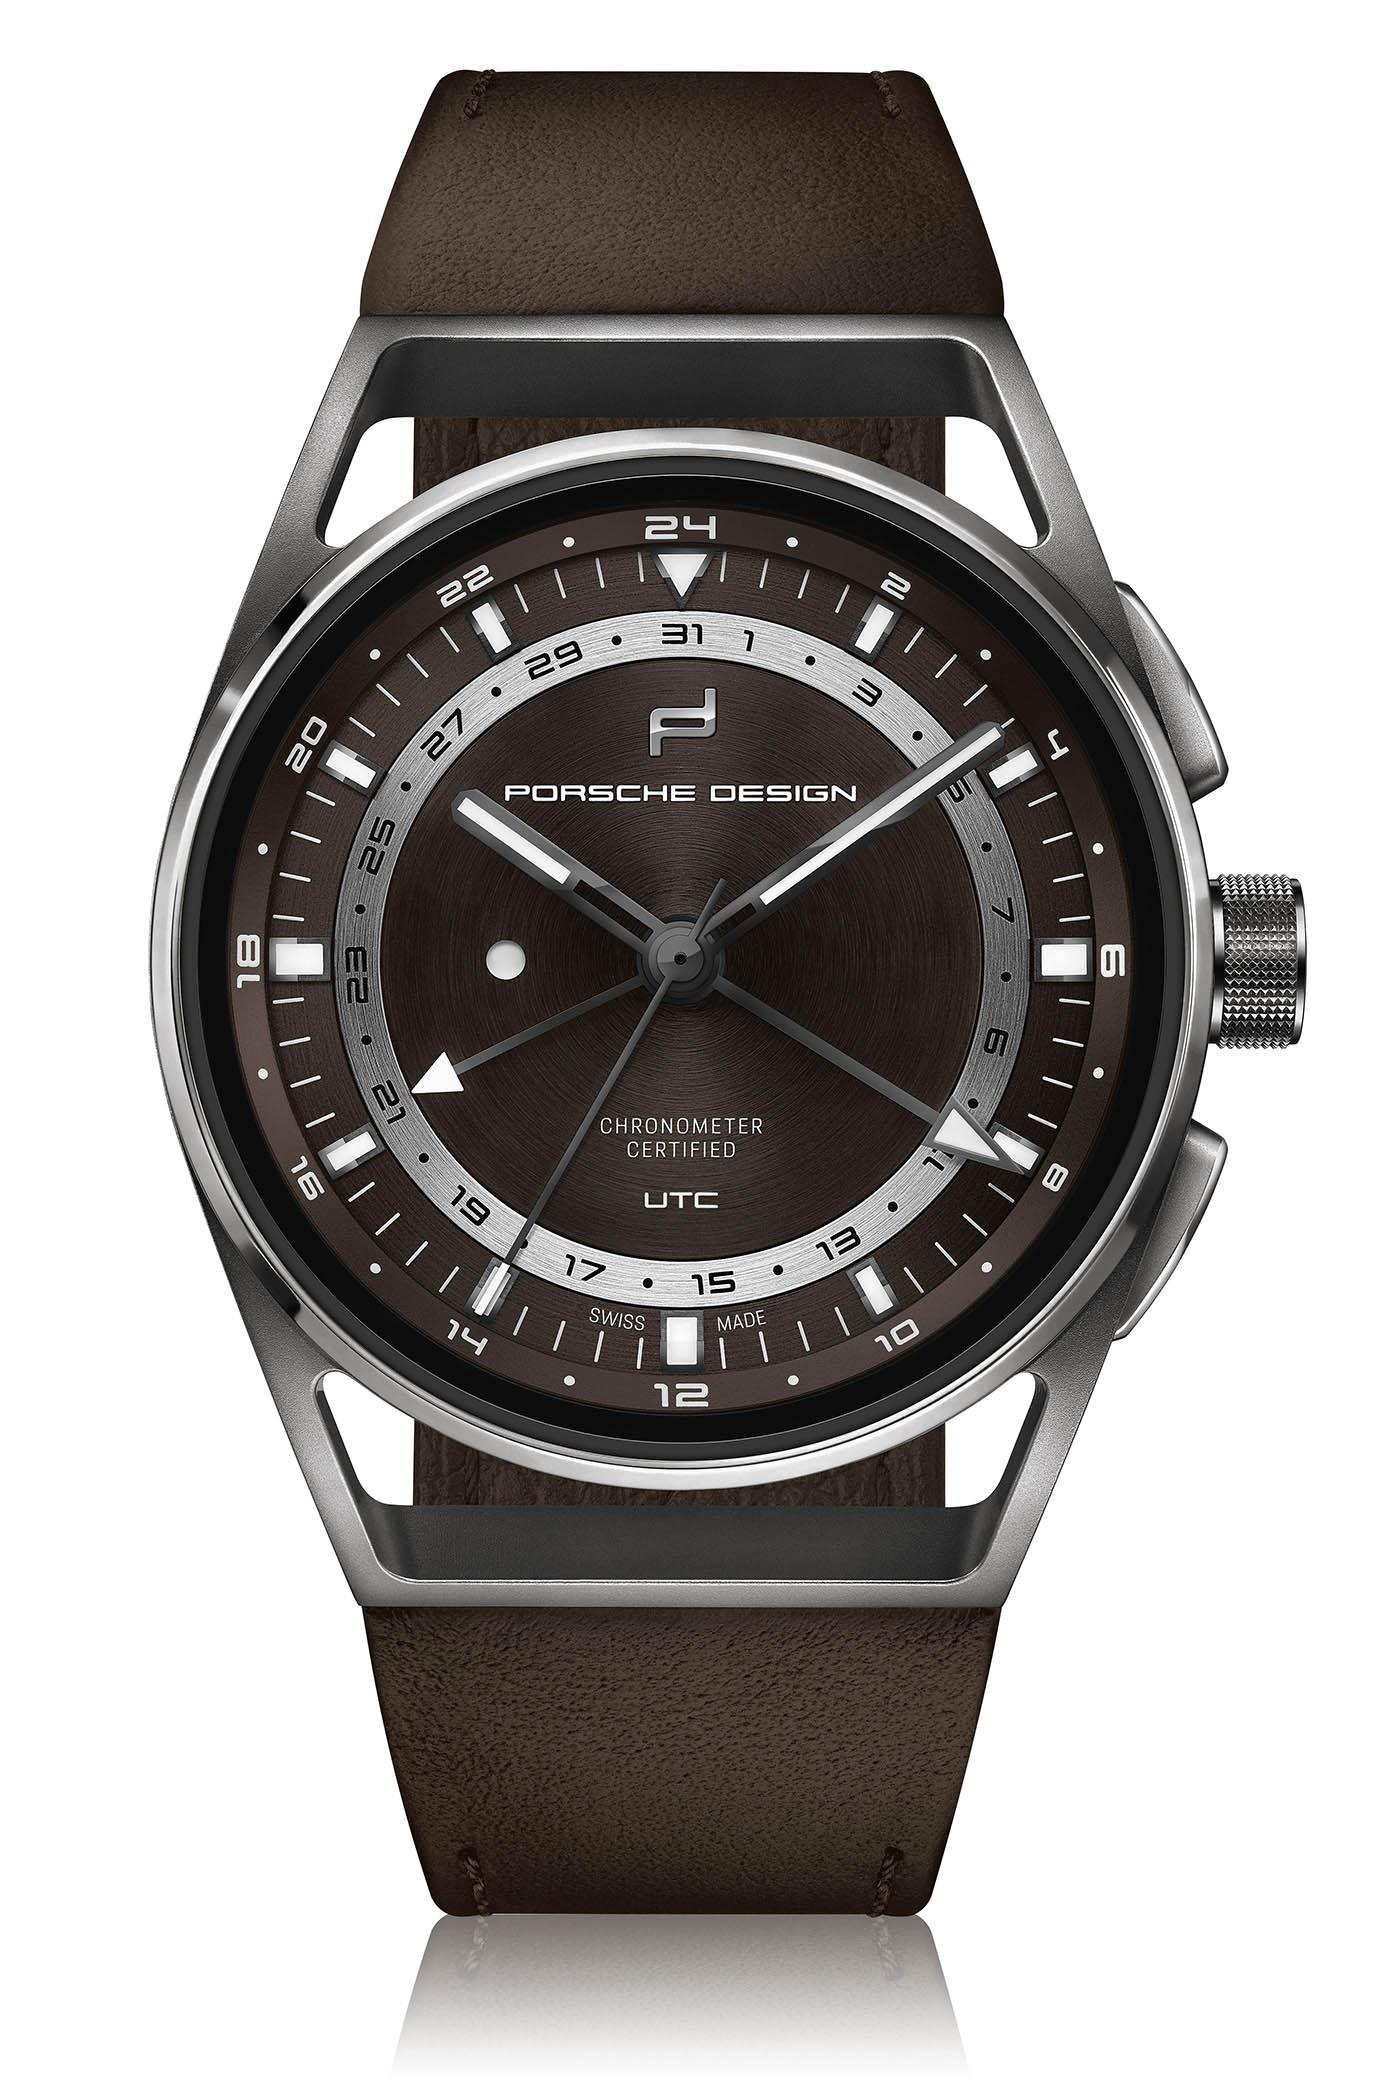 Porsche Design 1919 Globetimer UTC - Baselworld 2019 - 1